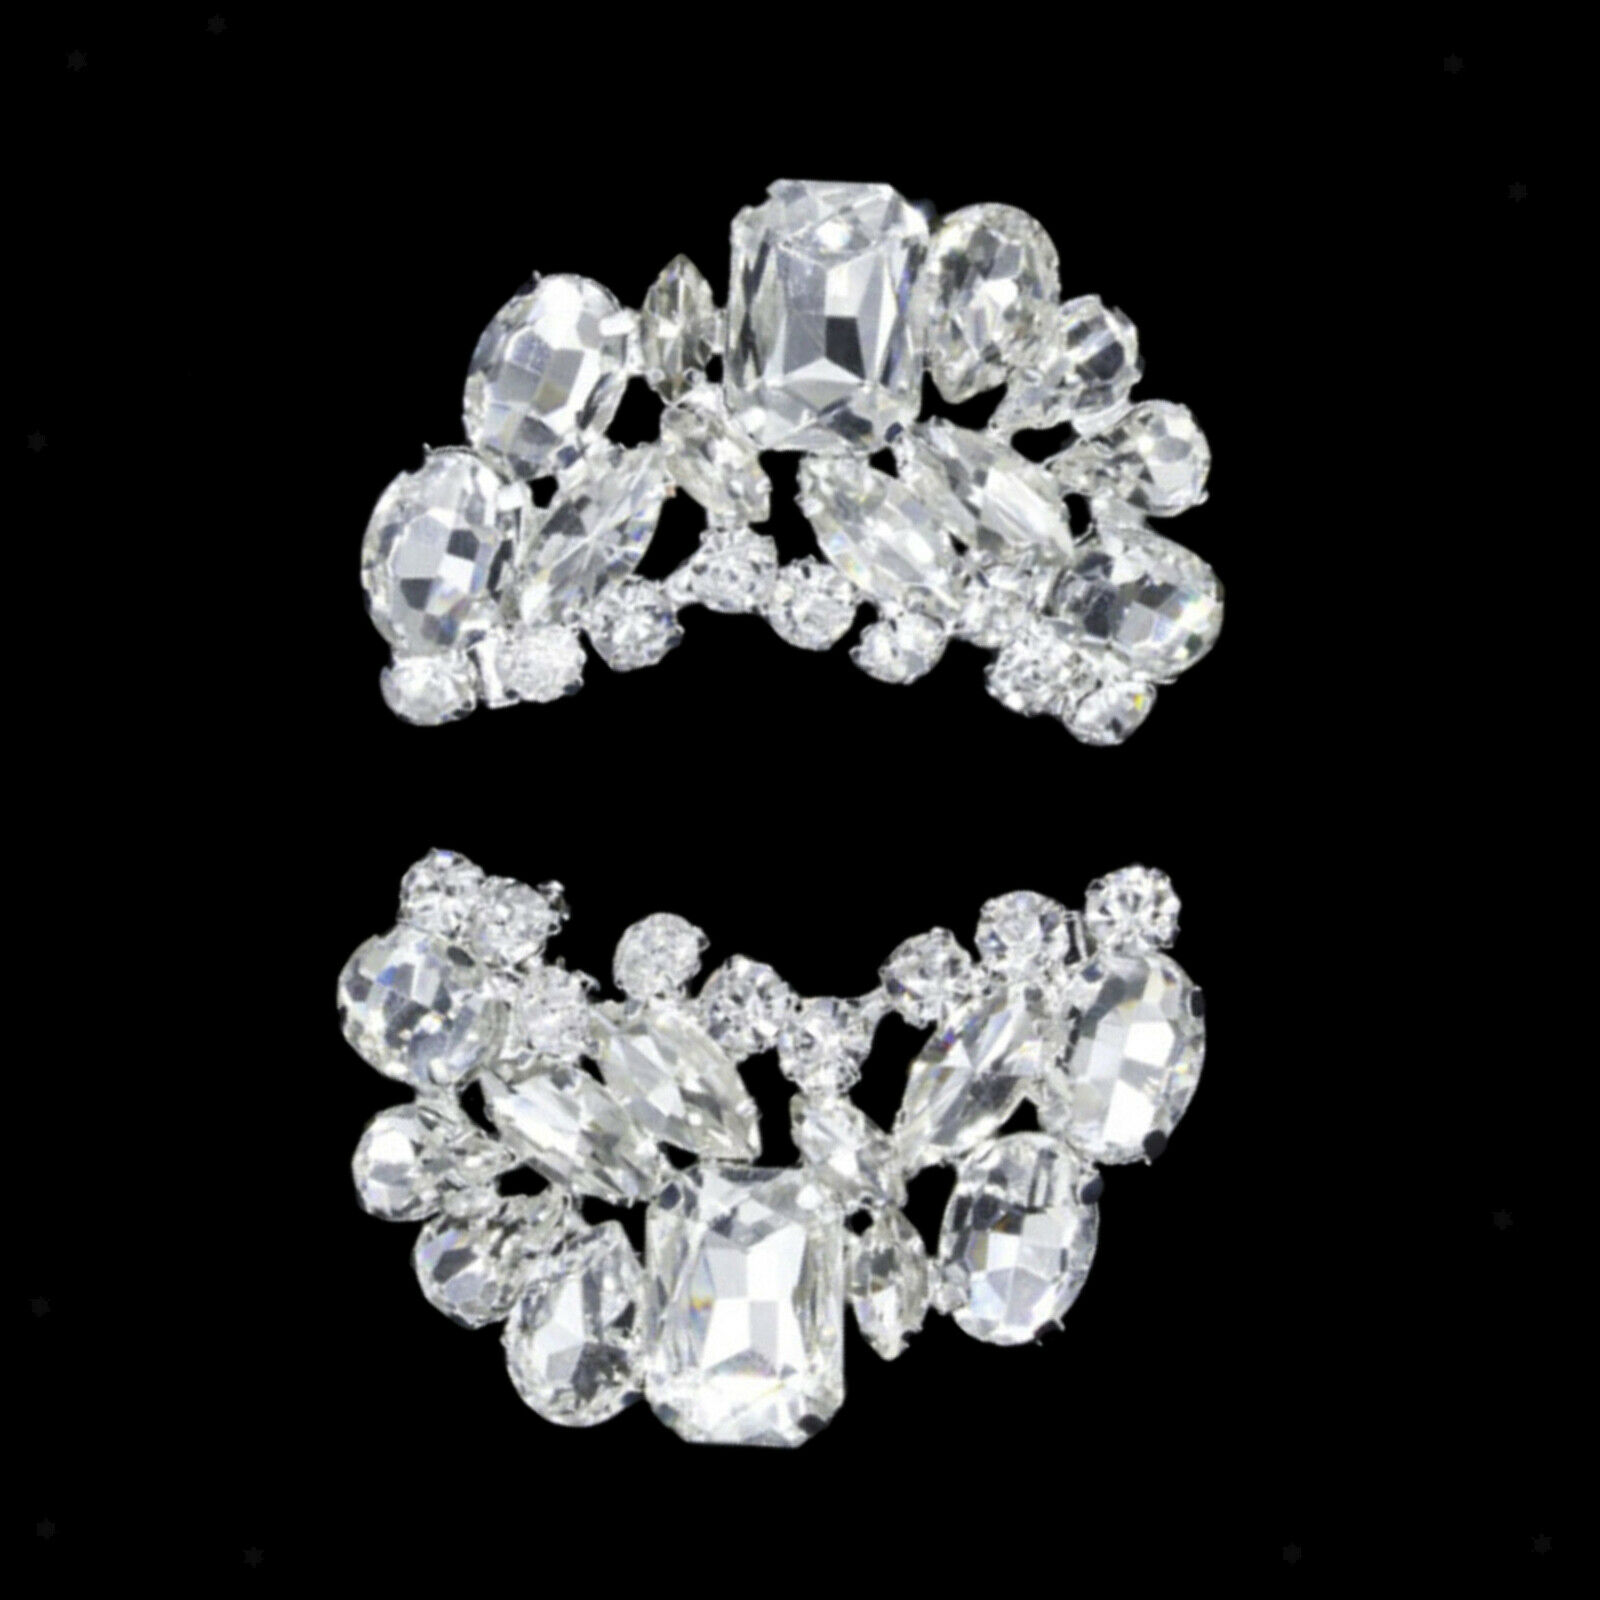 2x Rhinestone Crystal Shoe Clips Womens Weddings Bridal Shoe Buckle Charms